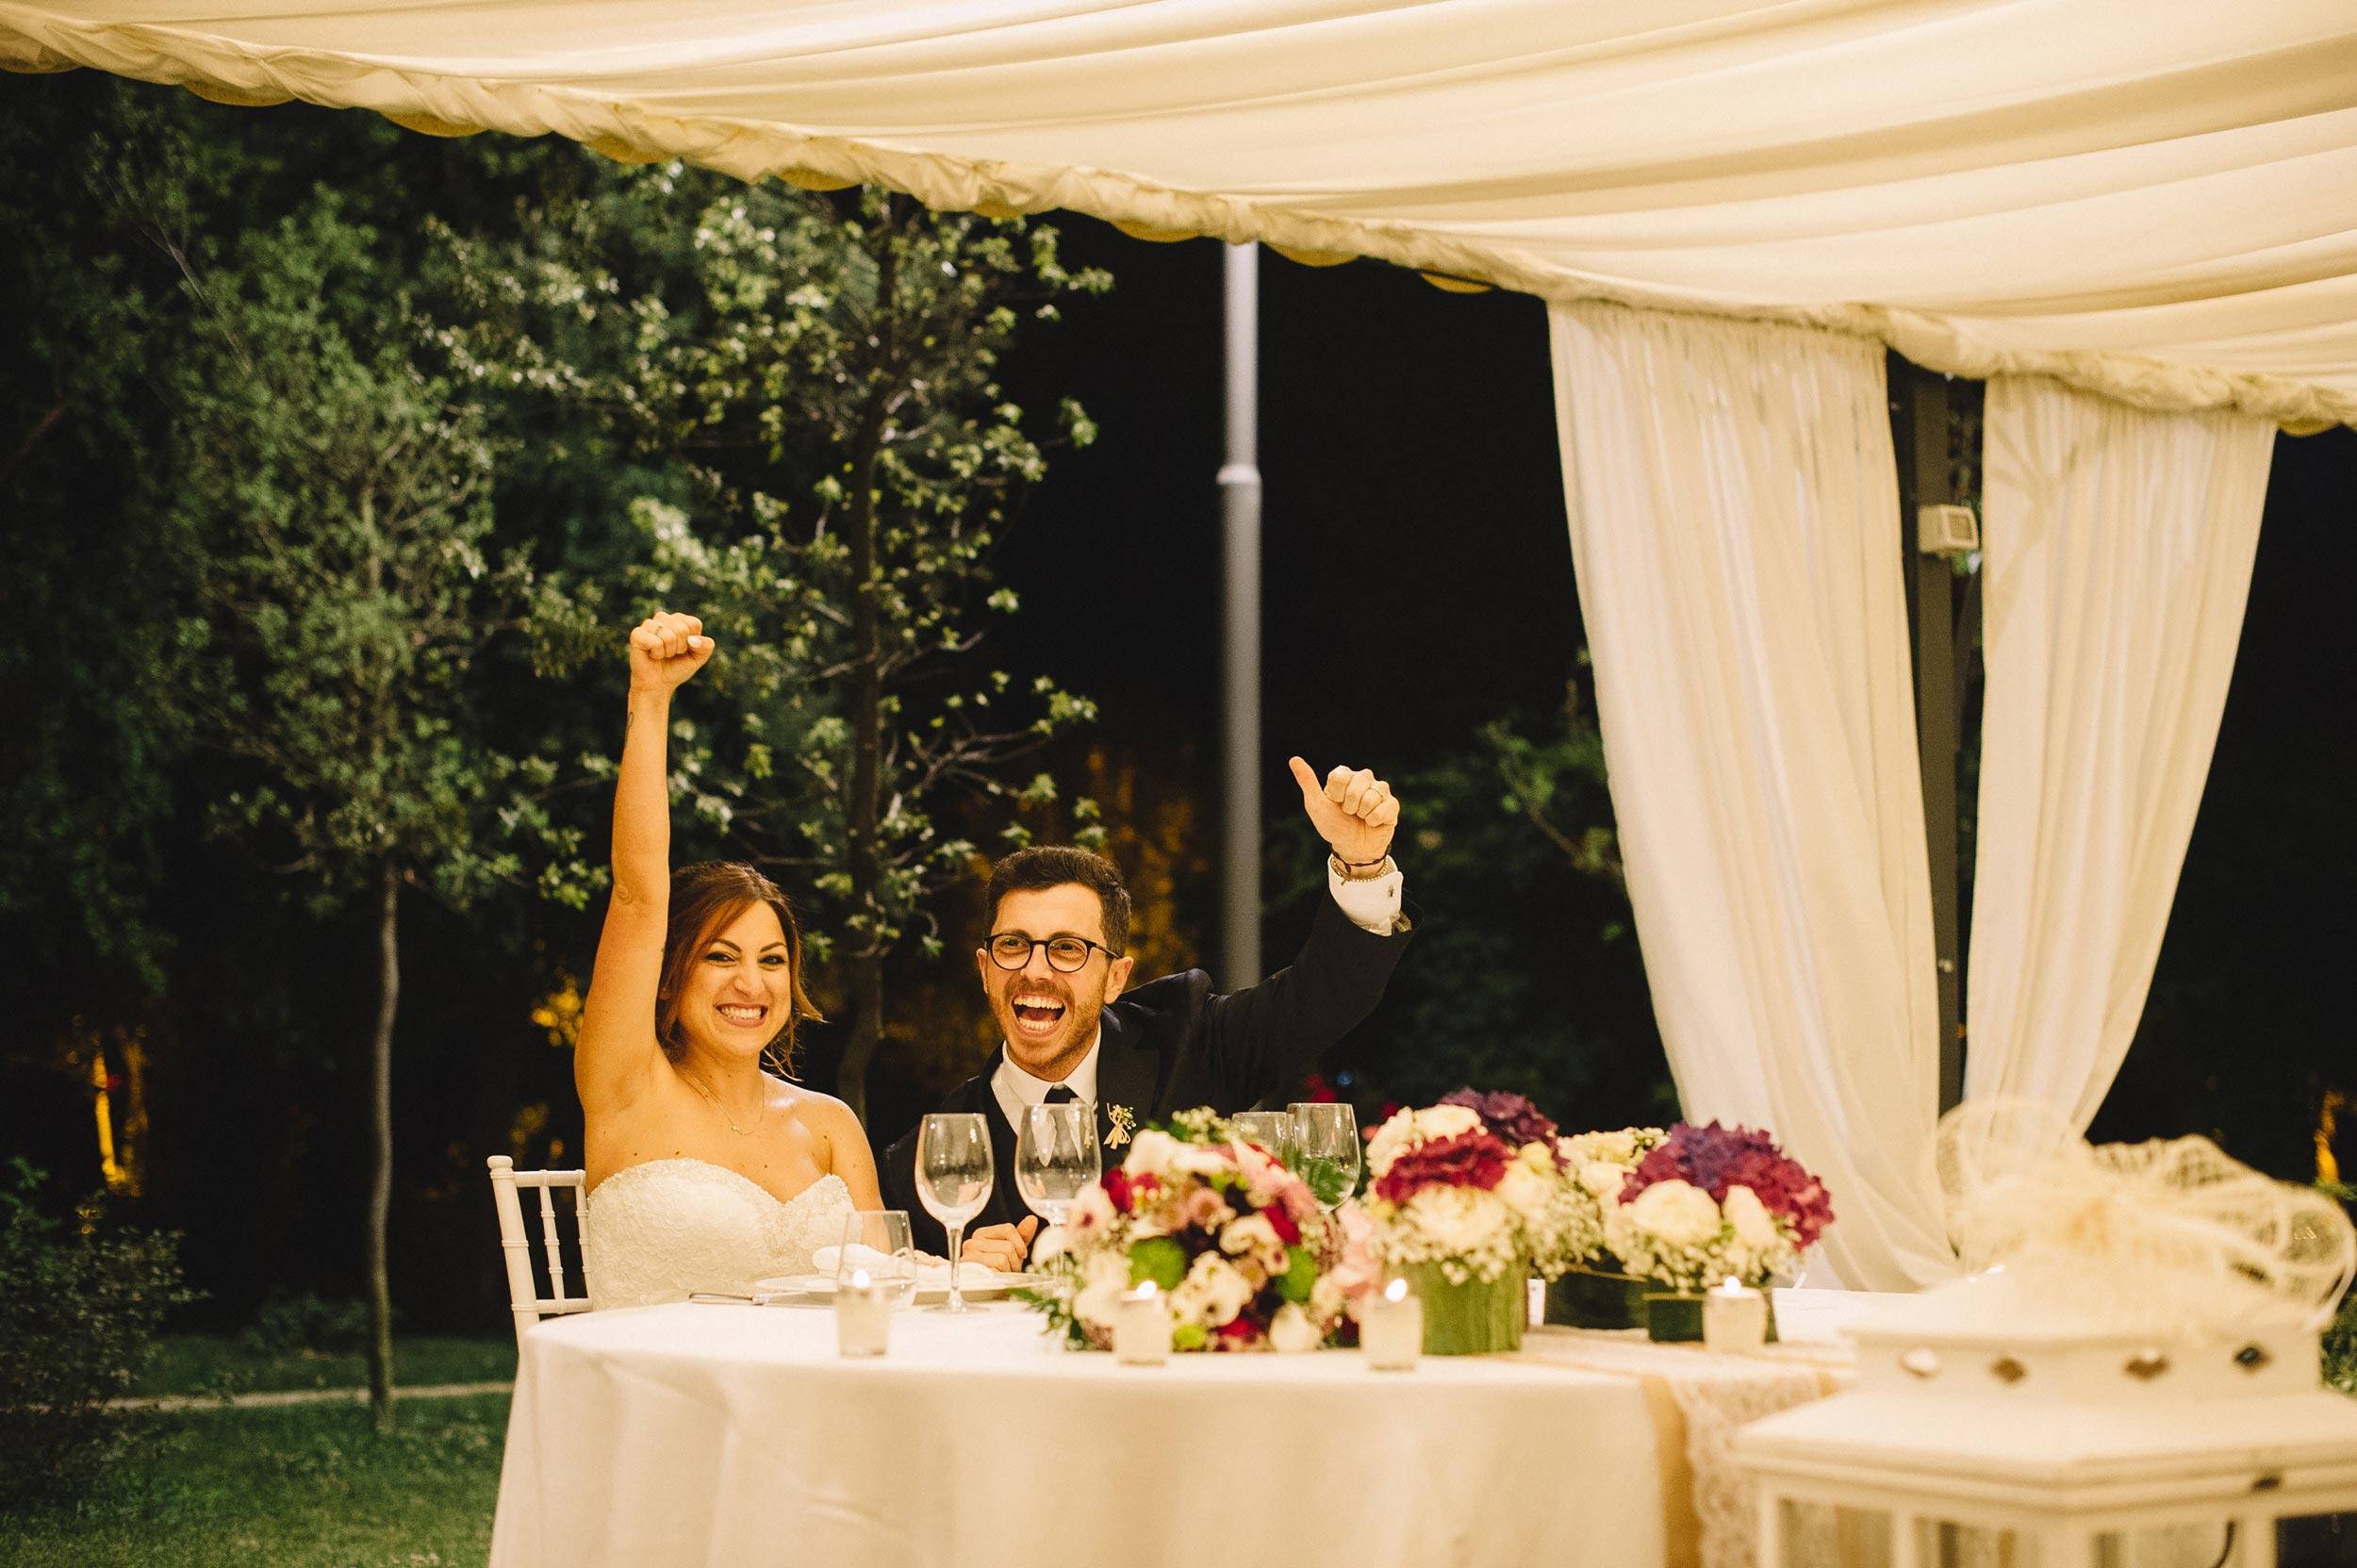 2016-Claudio-Teresa-Naples-Wedding-Photographer-Italy-Alessandro-Avenali-88.jpg